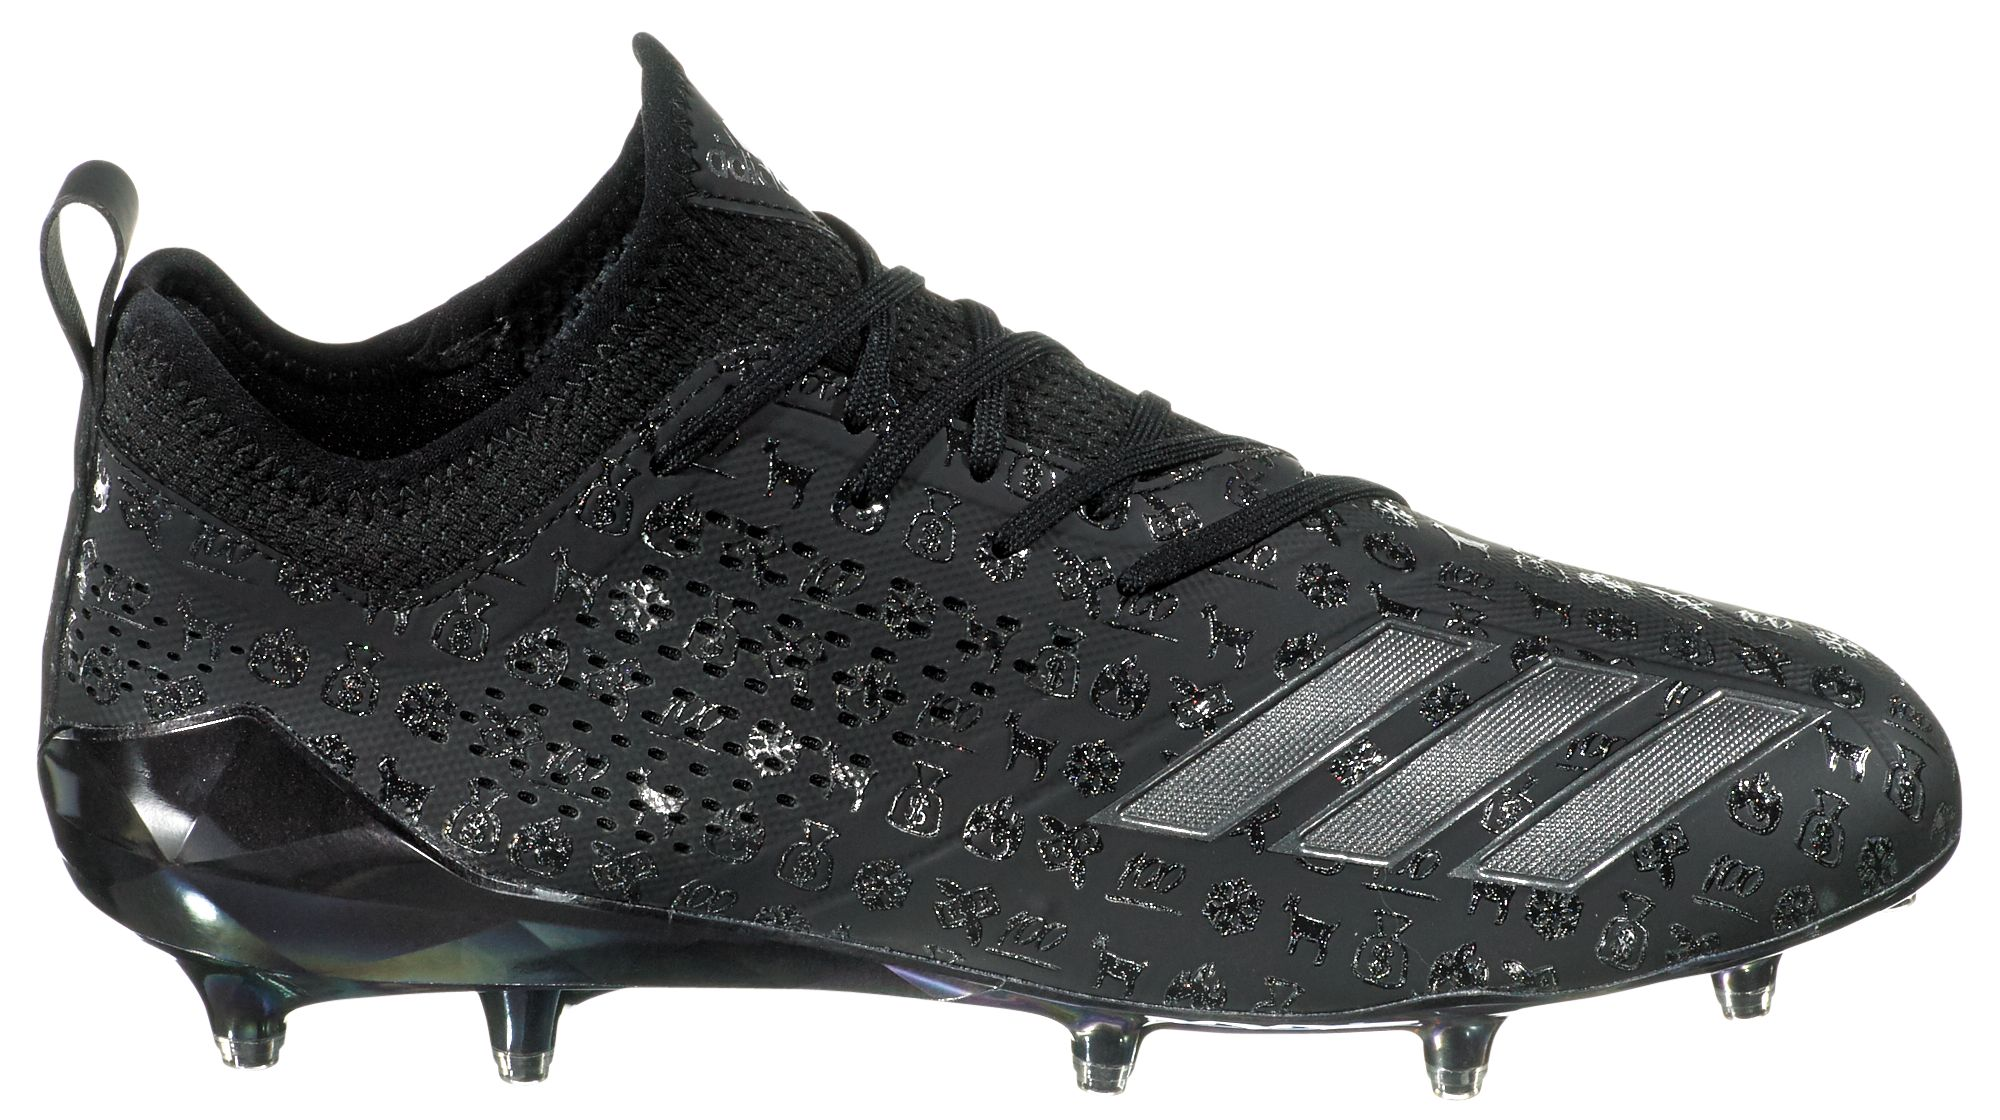 Adidas Mens Adizero 5-Star 70 Adimoji Football Cleats -6220